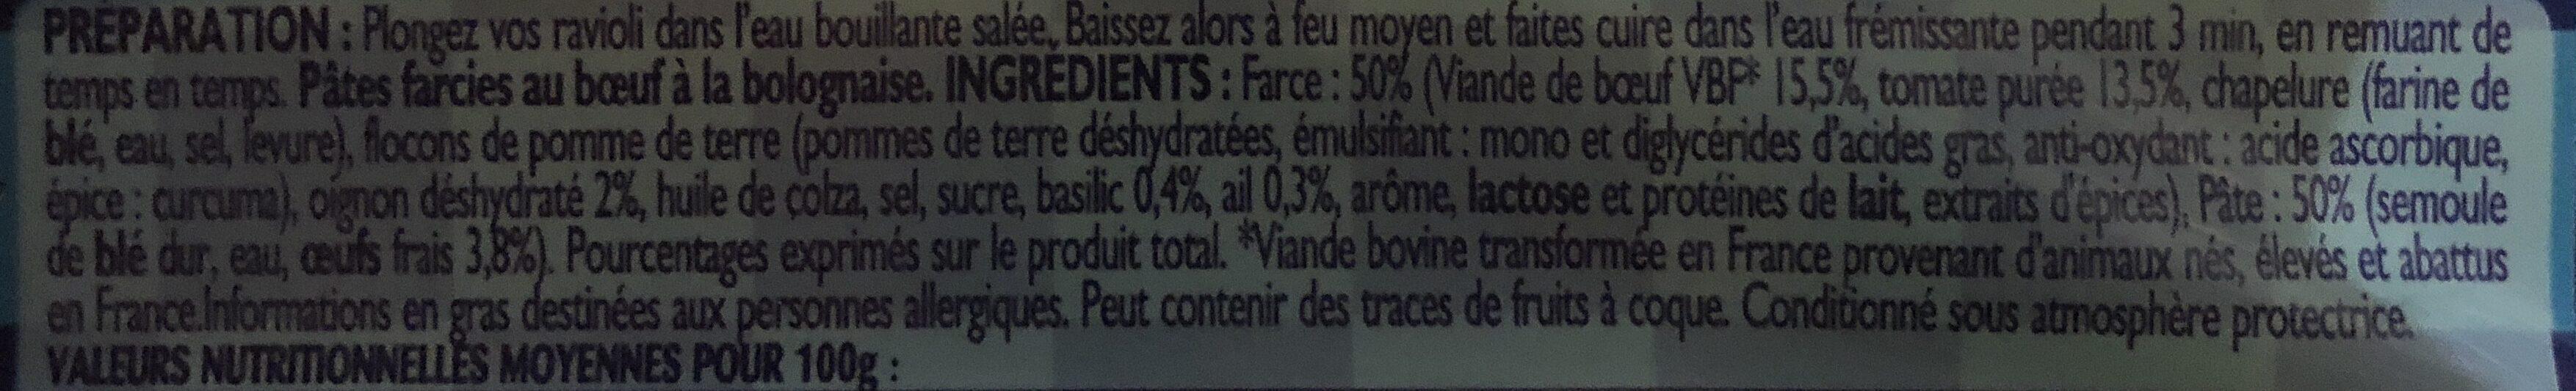 Lustucru ravioli bœuf bolognaise 500g format maxi - Ingrédients - fr